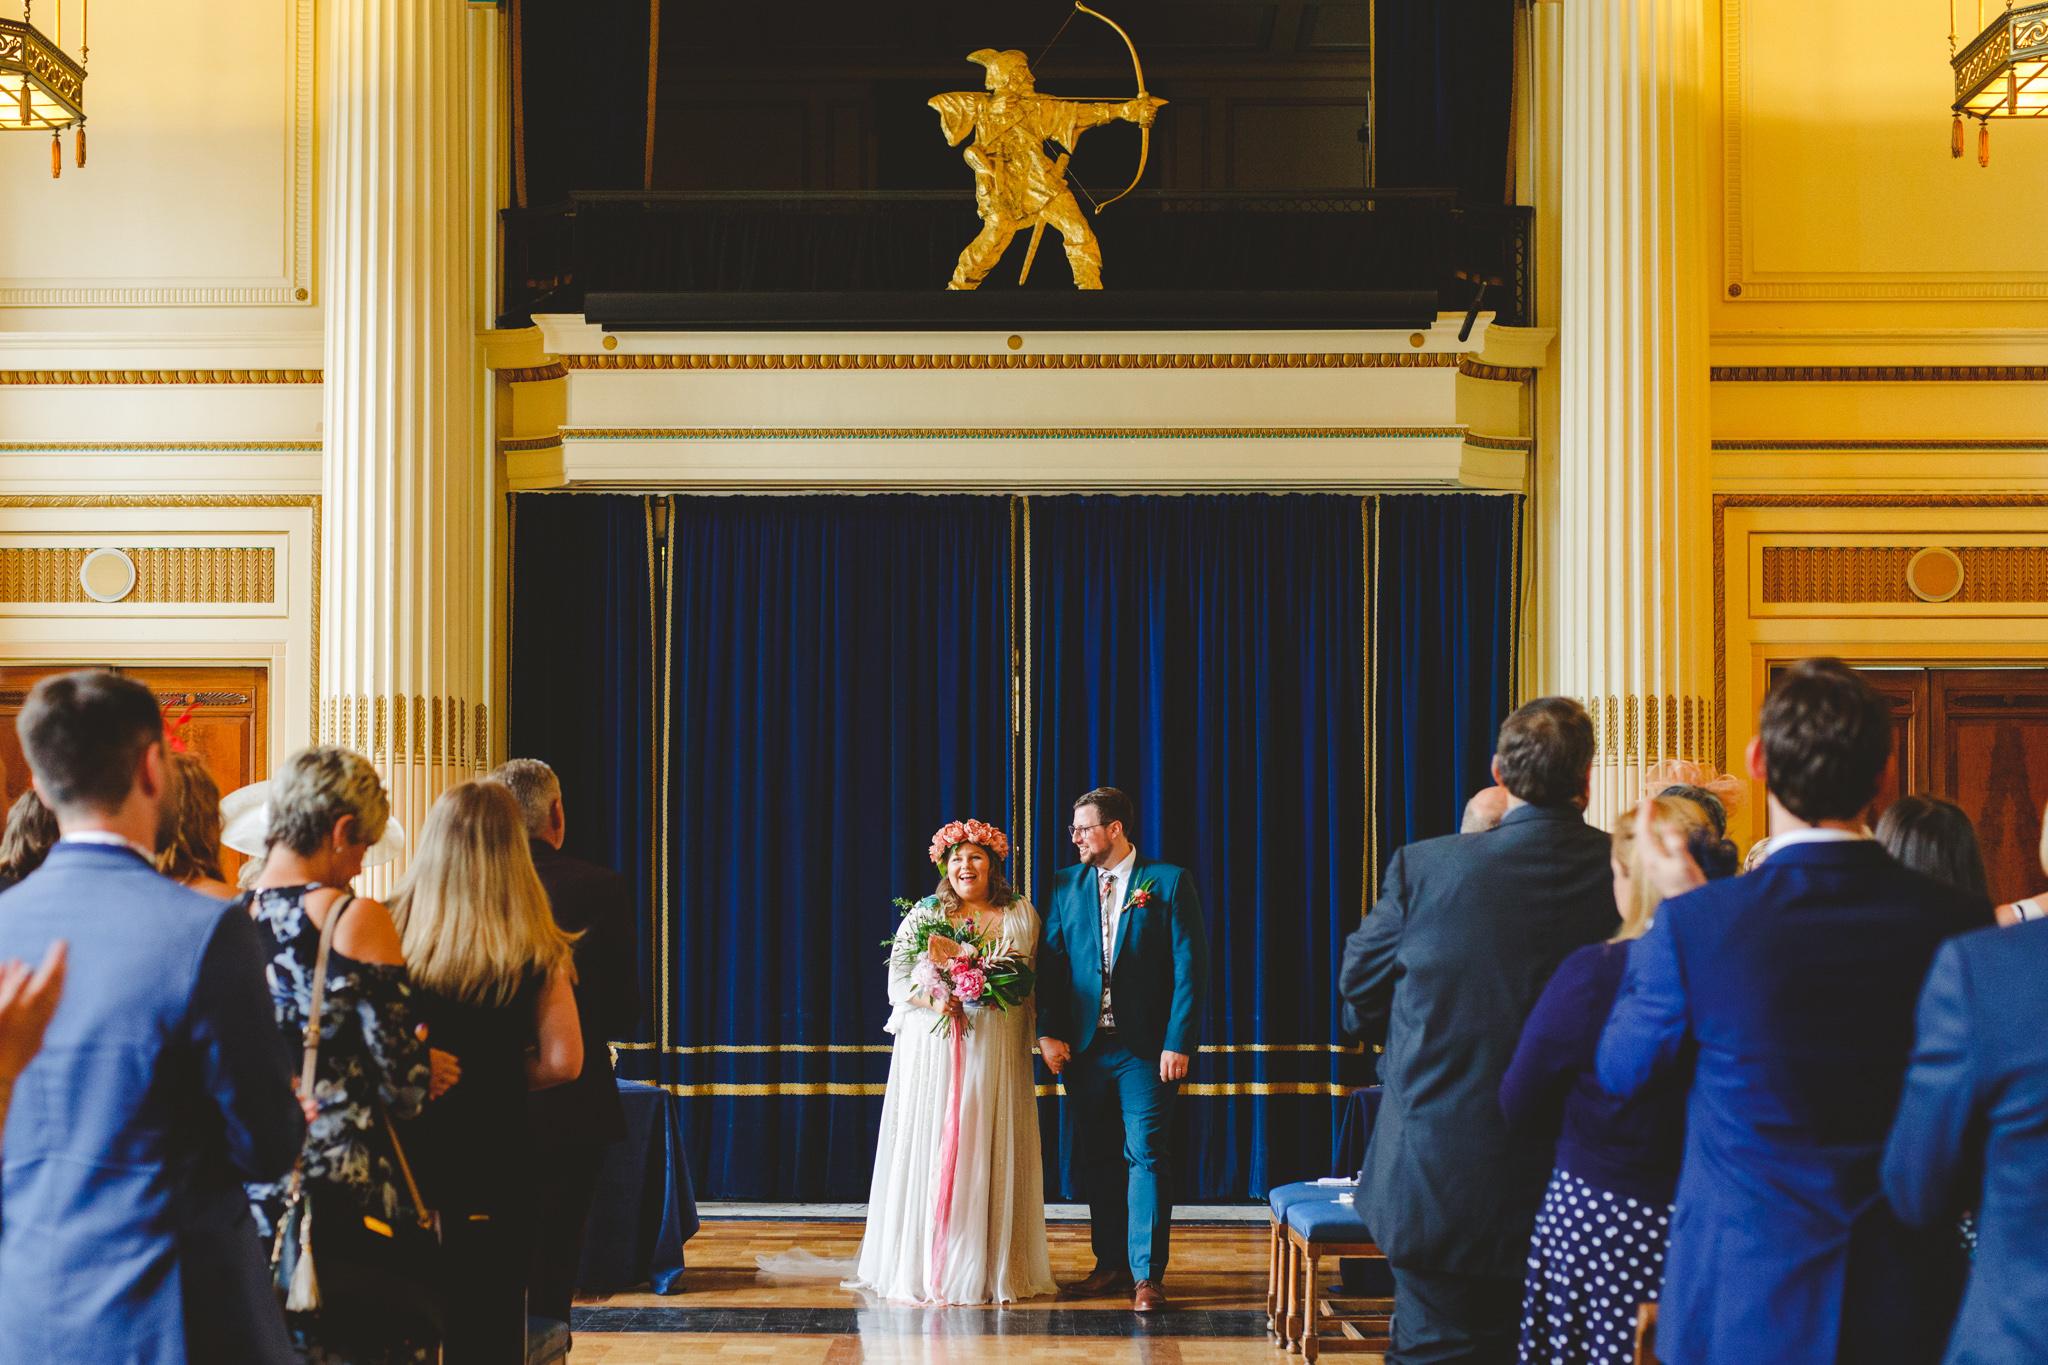 derbyshire-wedding-photographer-videographer-camera-hannah-16.jpg